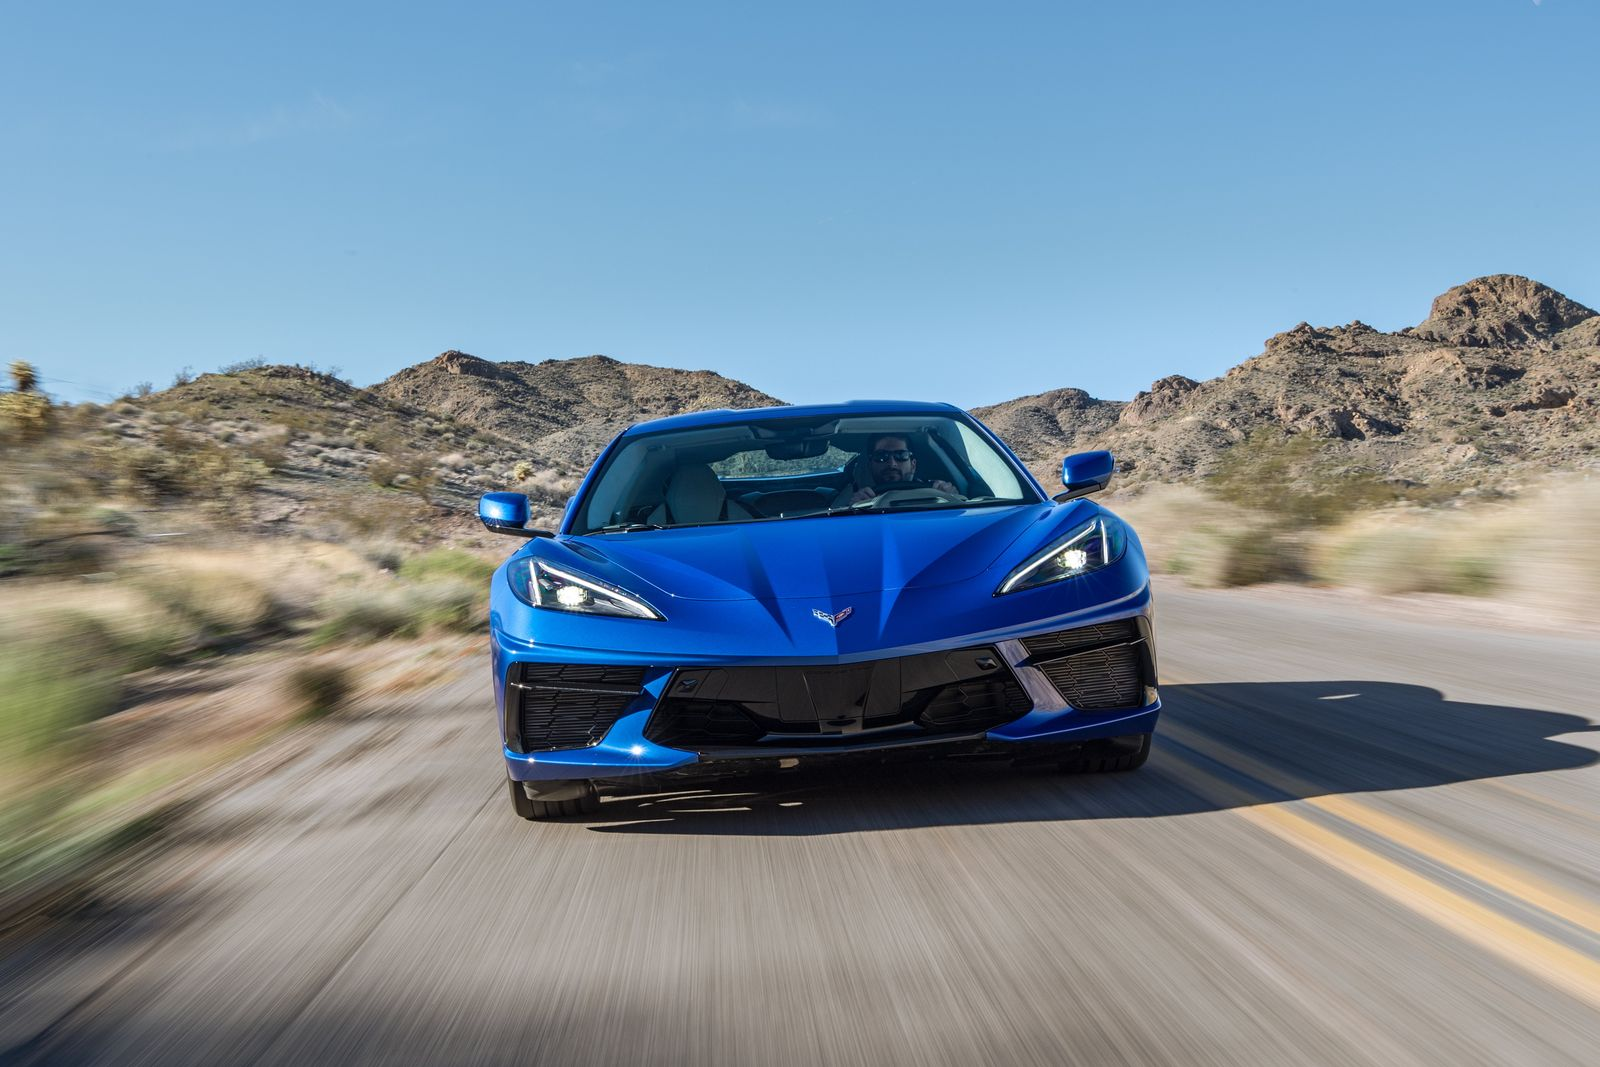 2020-Corvette-D55_8474